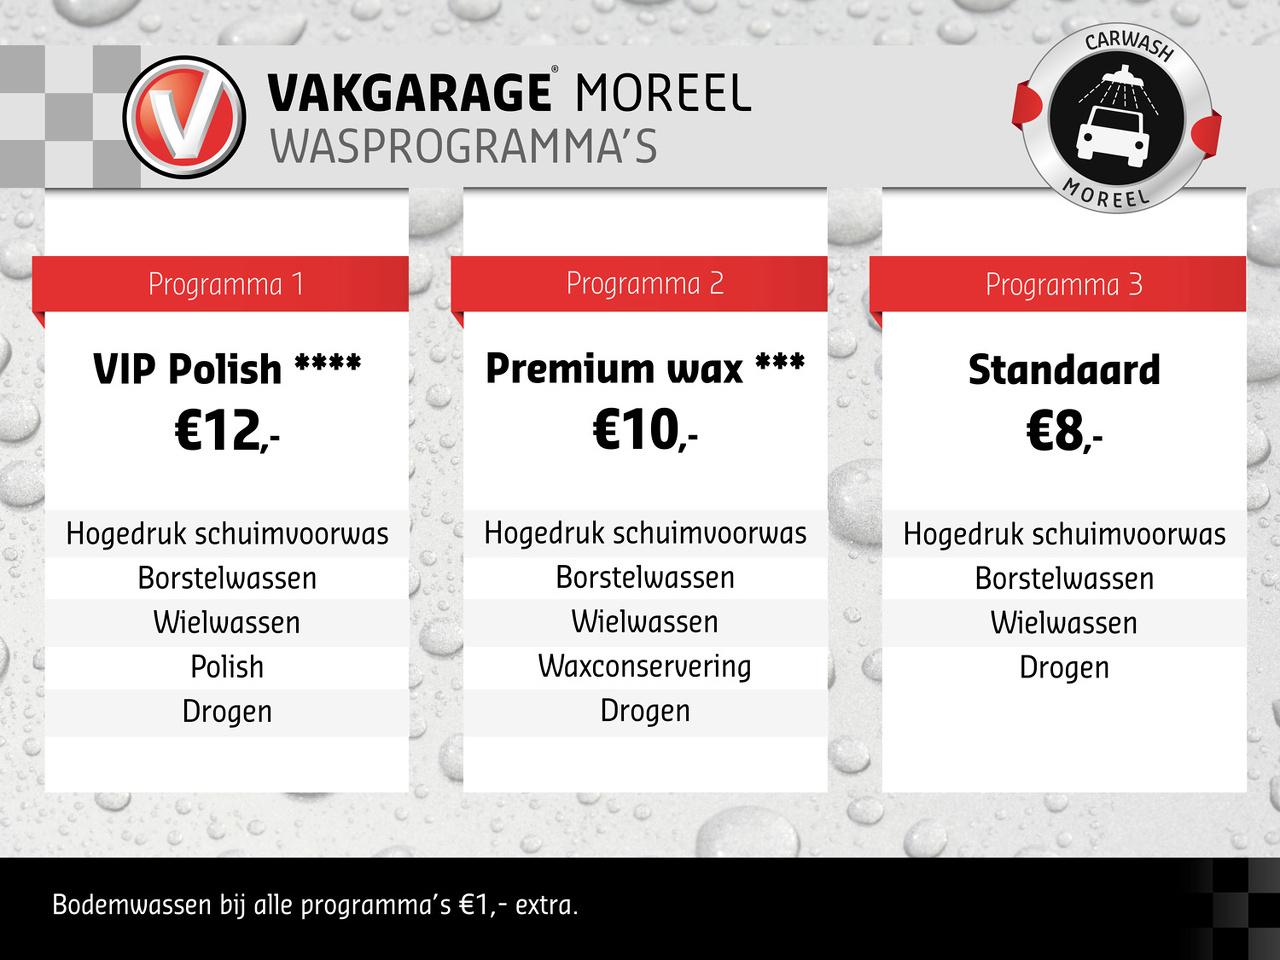 VG-Moreel-Carwash-bord-100x75cm.jpg